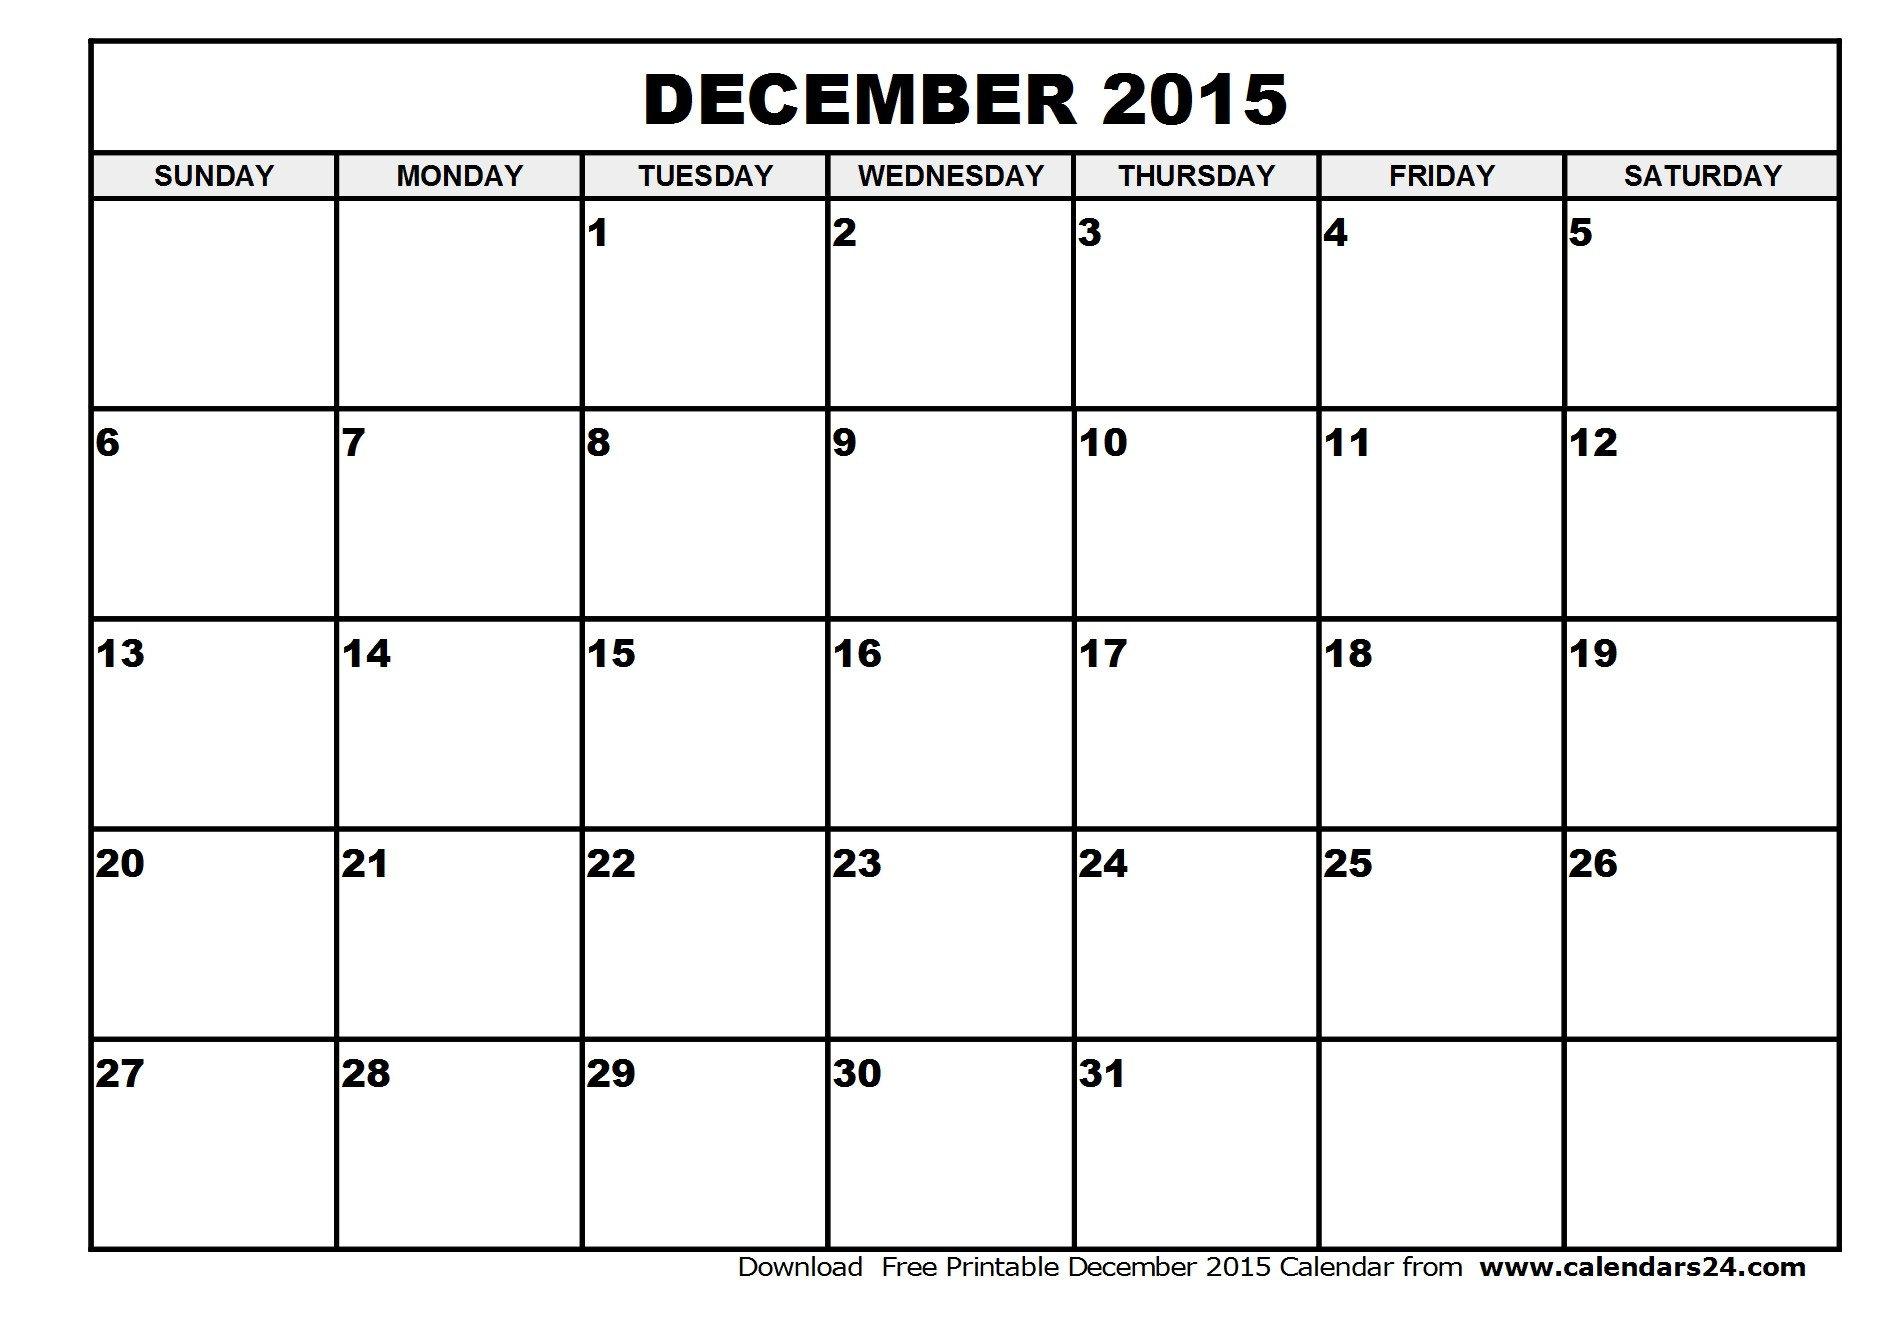 Calendario Dezembro 2017 Para Imprimir Excel Más Reciente Dentrodabiblia December 2015 Able Calendar Of Calendario Dezembro 2017 Para Imprimir Excel Más Actual Maria Sissi Sambasissi No Pinterest